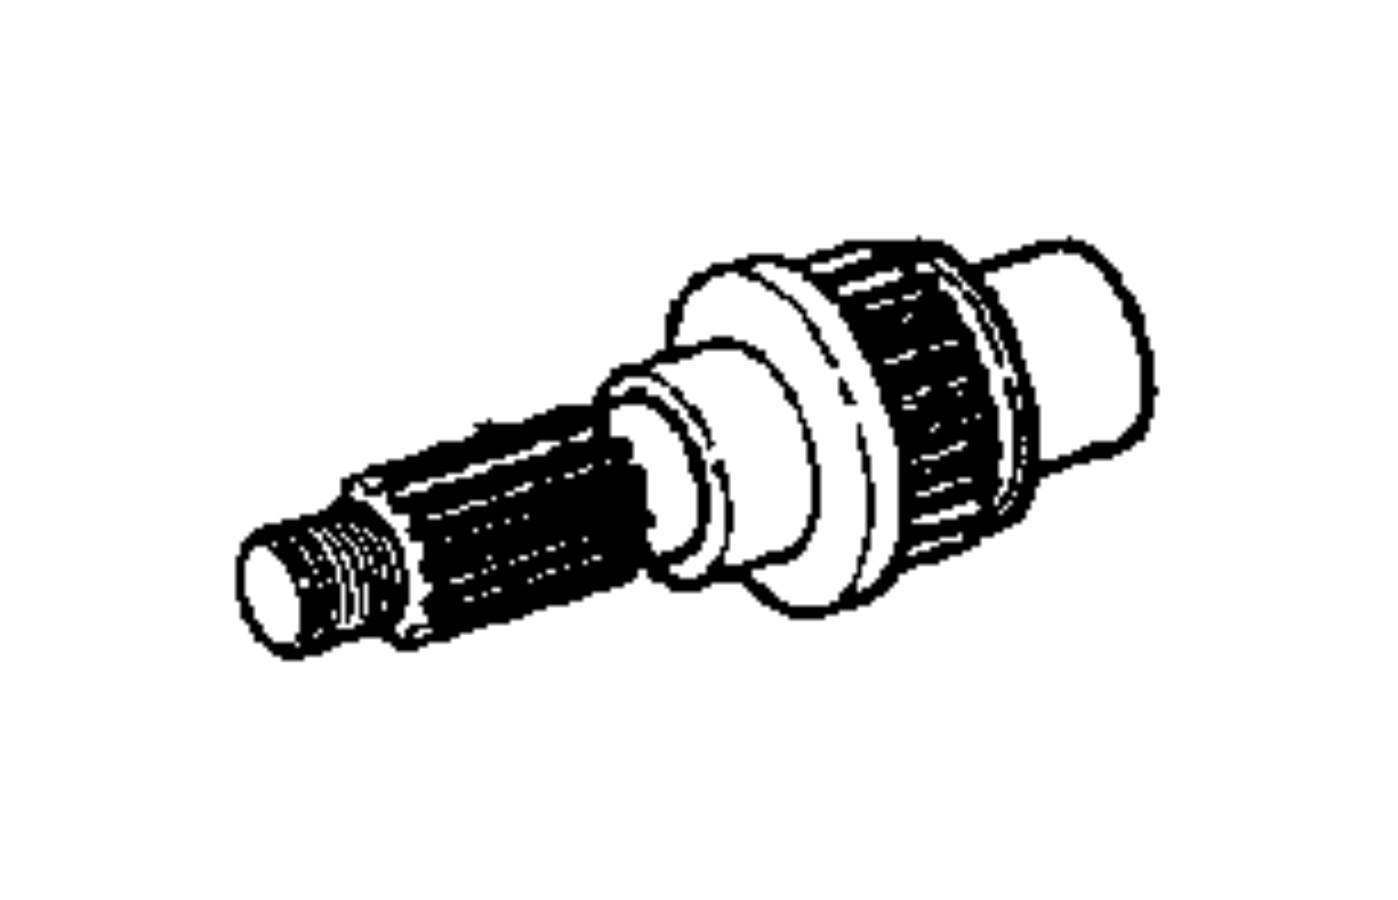 2005 Jeep Liberty Output shaft. Transfer case. Train, gear